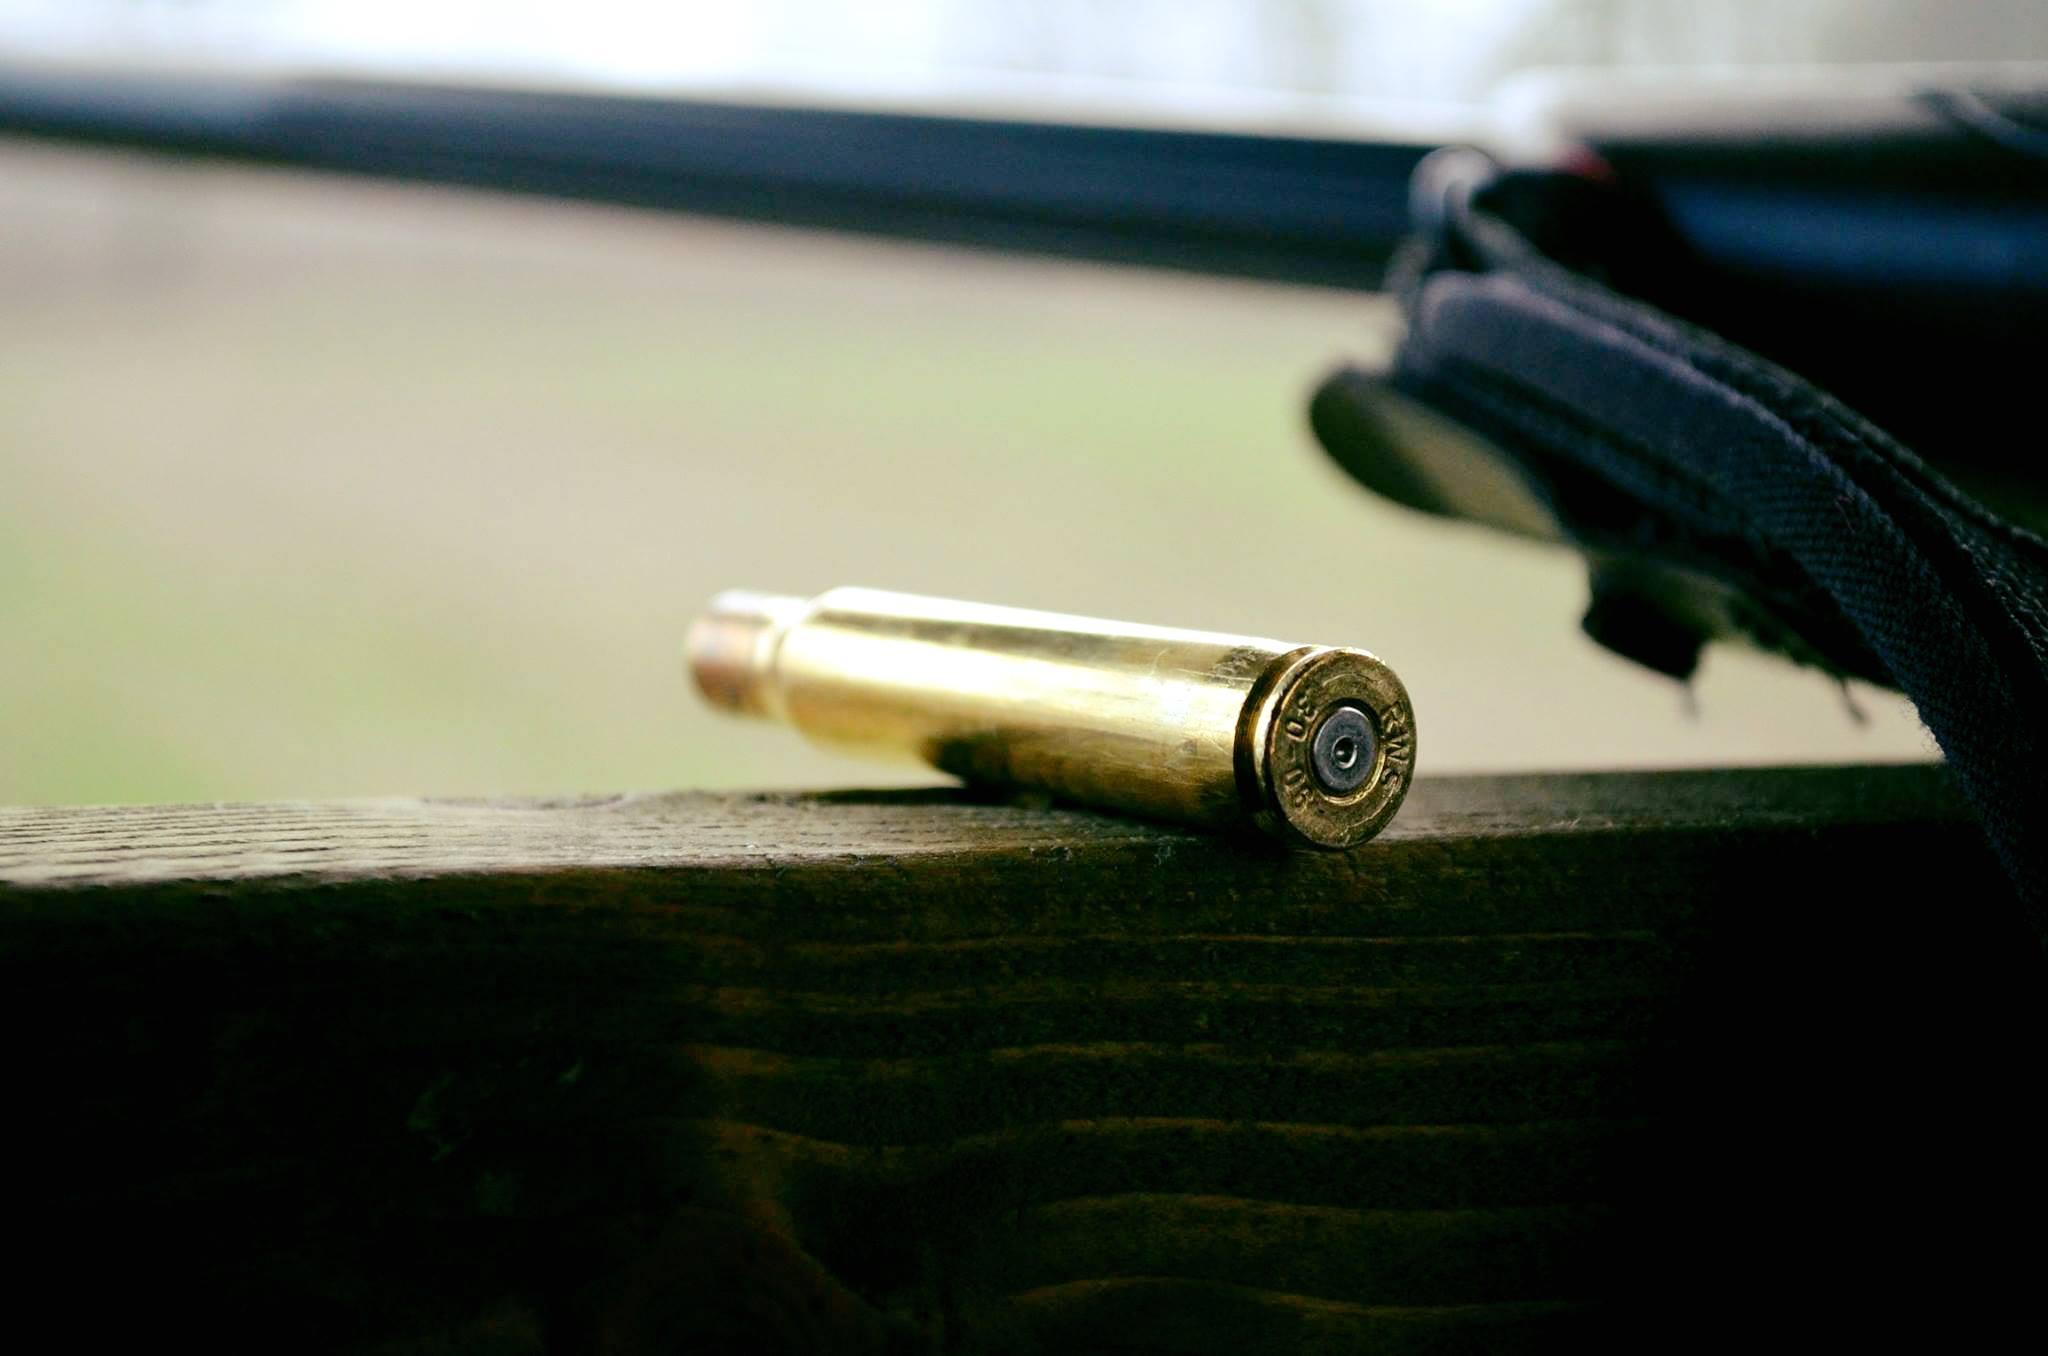 RWS HiT – Bleifreie Jagdmunition